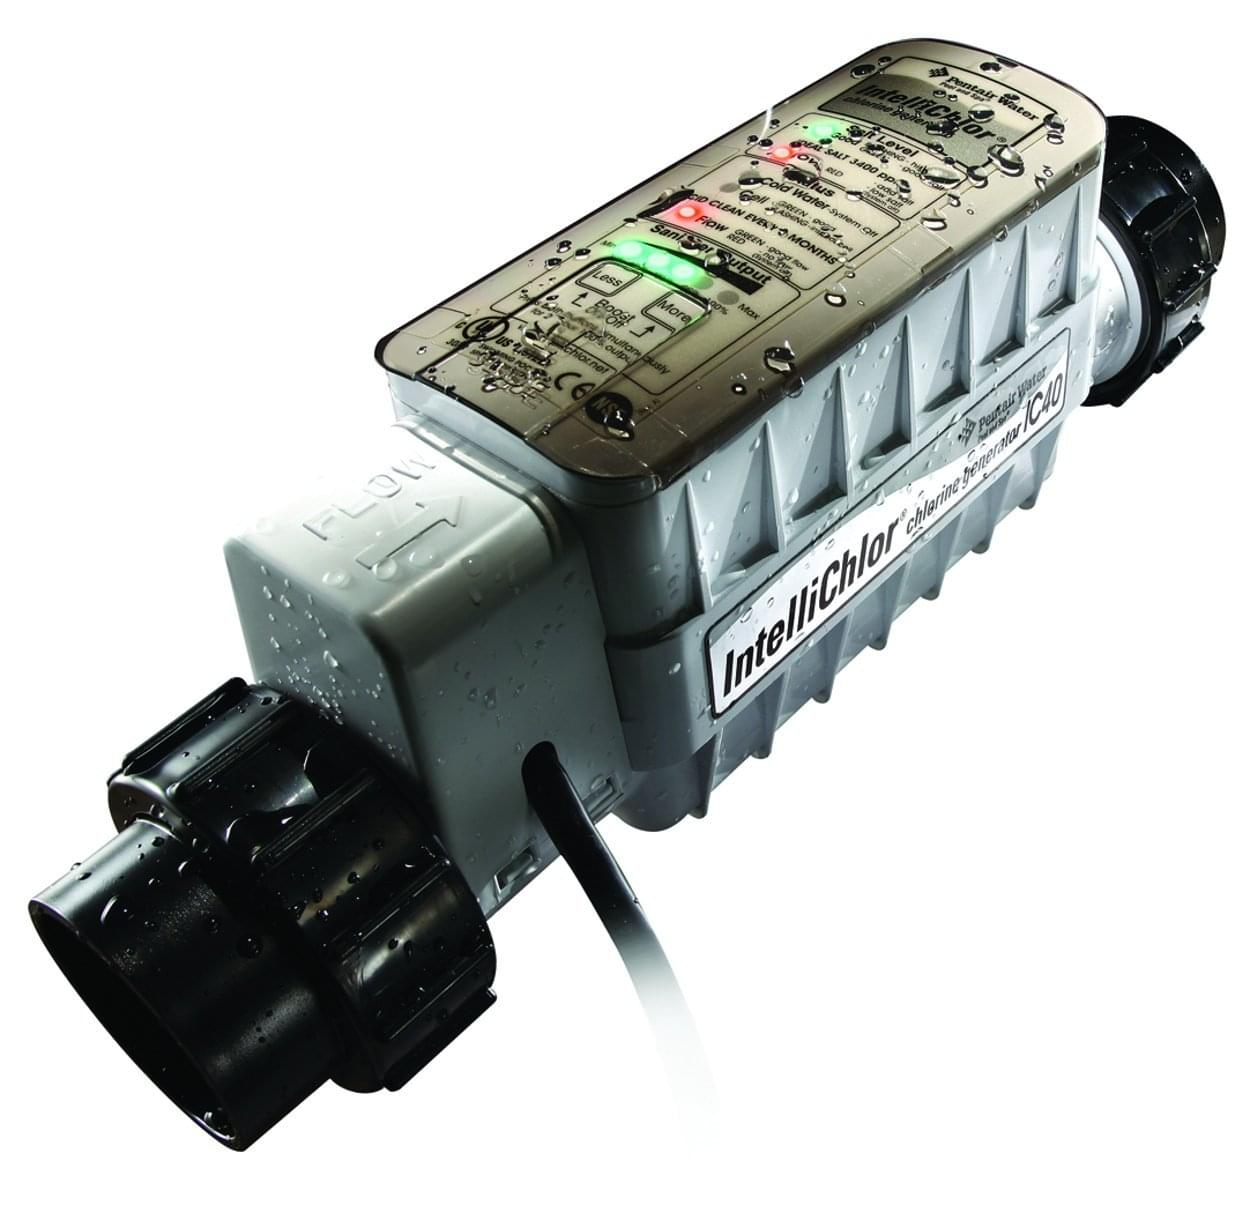 Pentair Pool Supplies Canada Home Parts Heater Minimax Plus Hp Heat Pump Circuit Board Intellichlor Ic40 Salt System